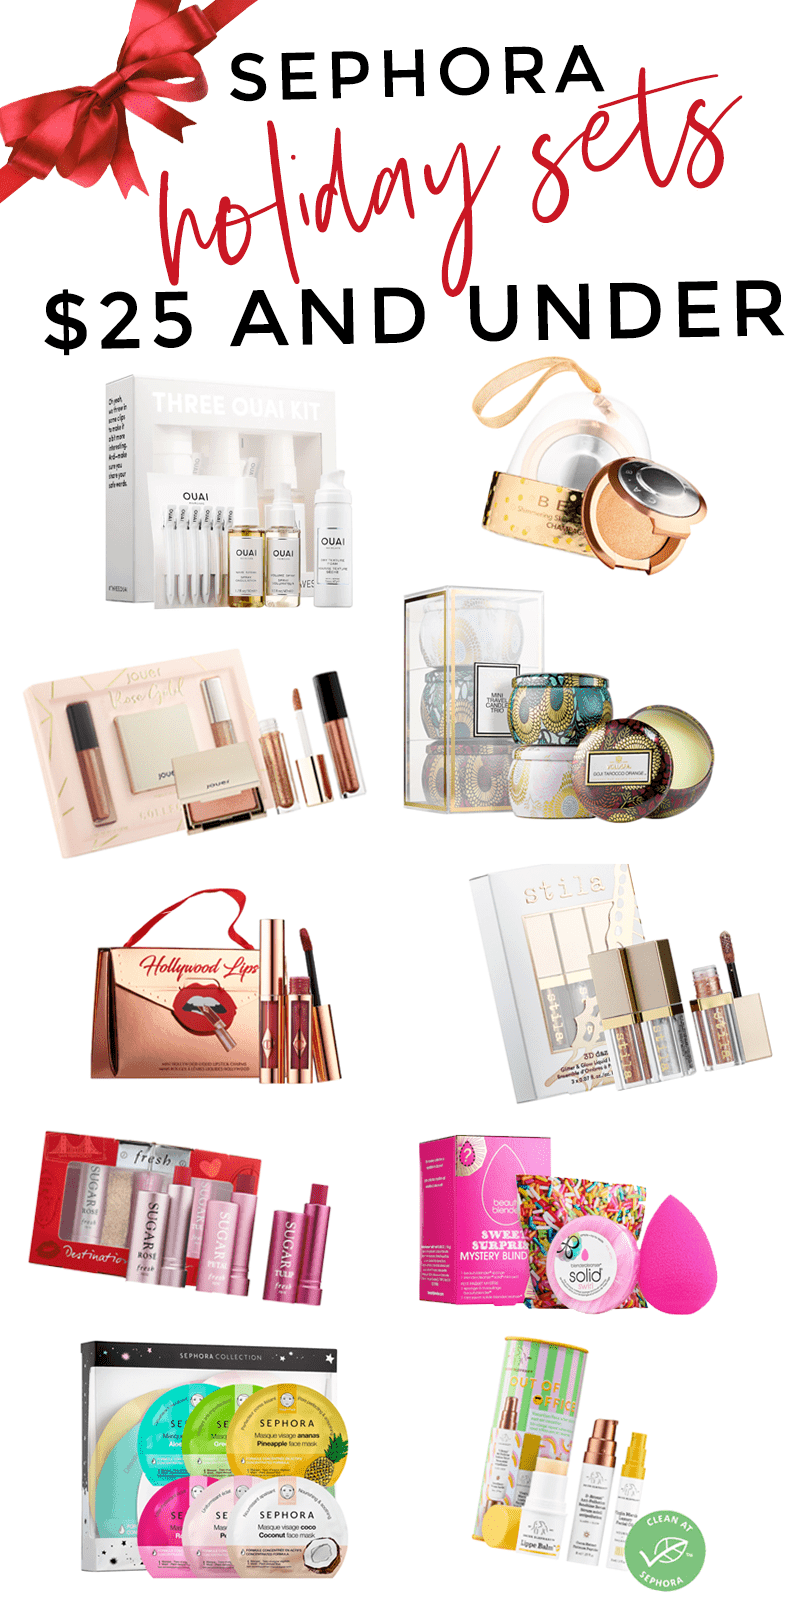 Sephora holiday sets $25 and under - amazing affordable gift ideas #holidaygift #giftideas #giftfguide #holidaygiftideas #beautygifts #beauty #makeup #beautyblogger #sephora